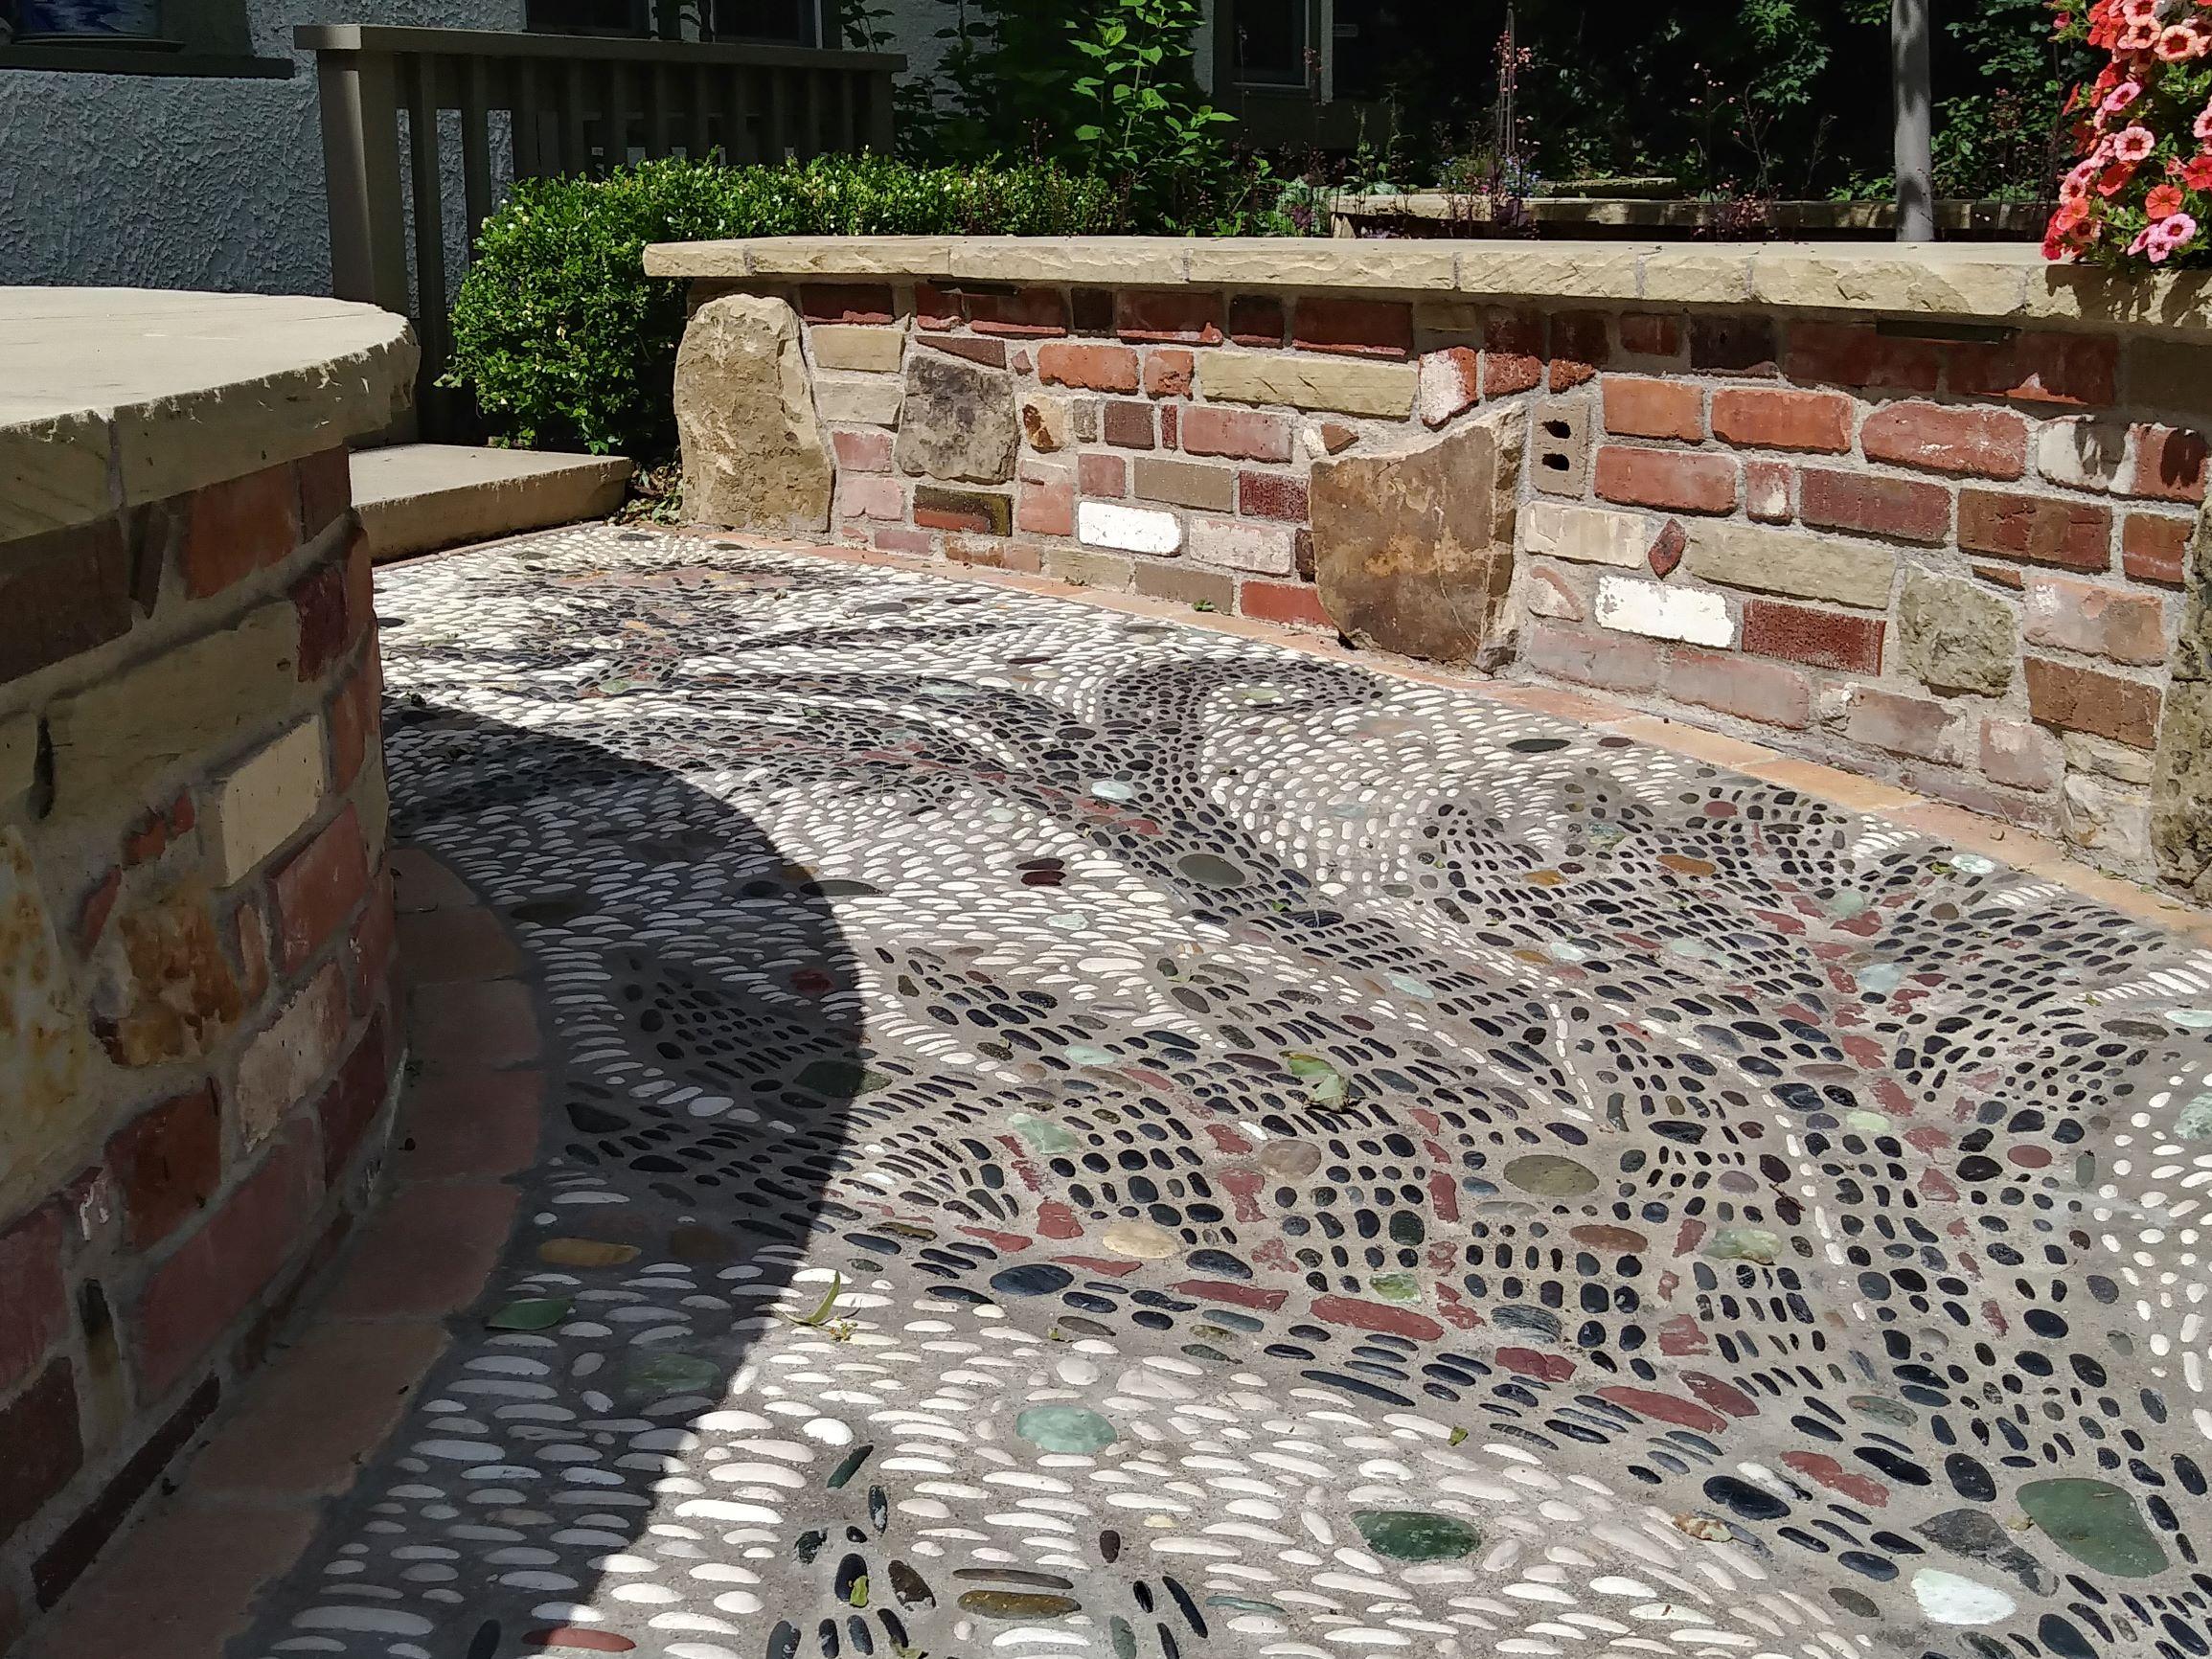 Small mosaic pathway with brick half walls and flat stone tops.